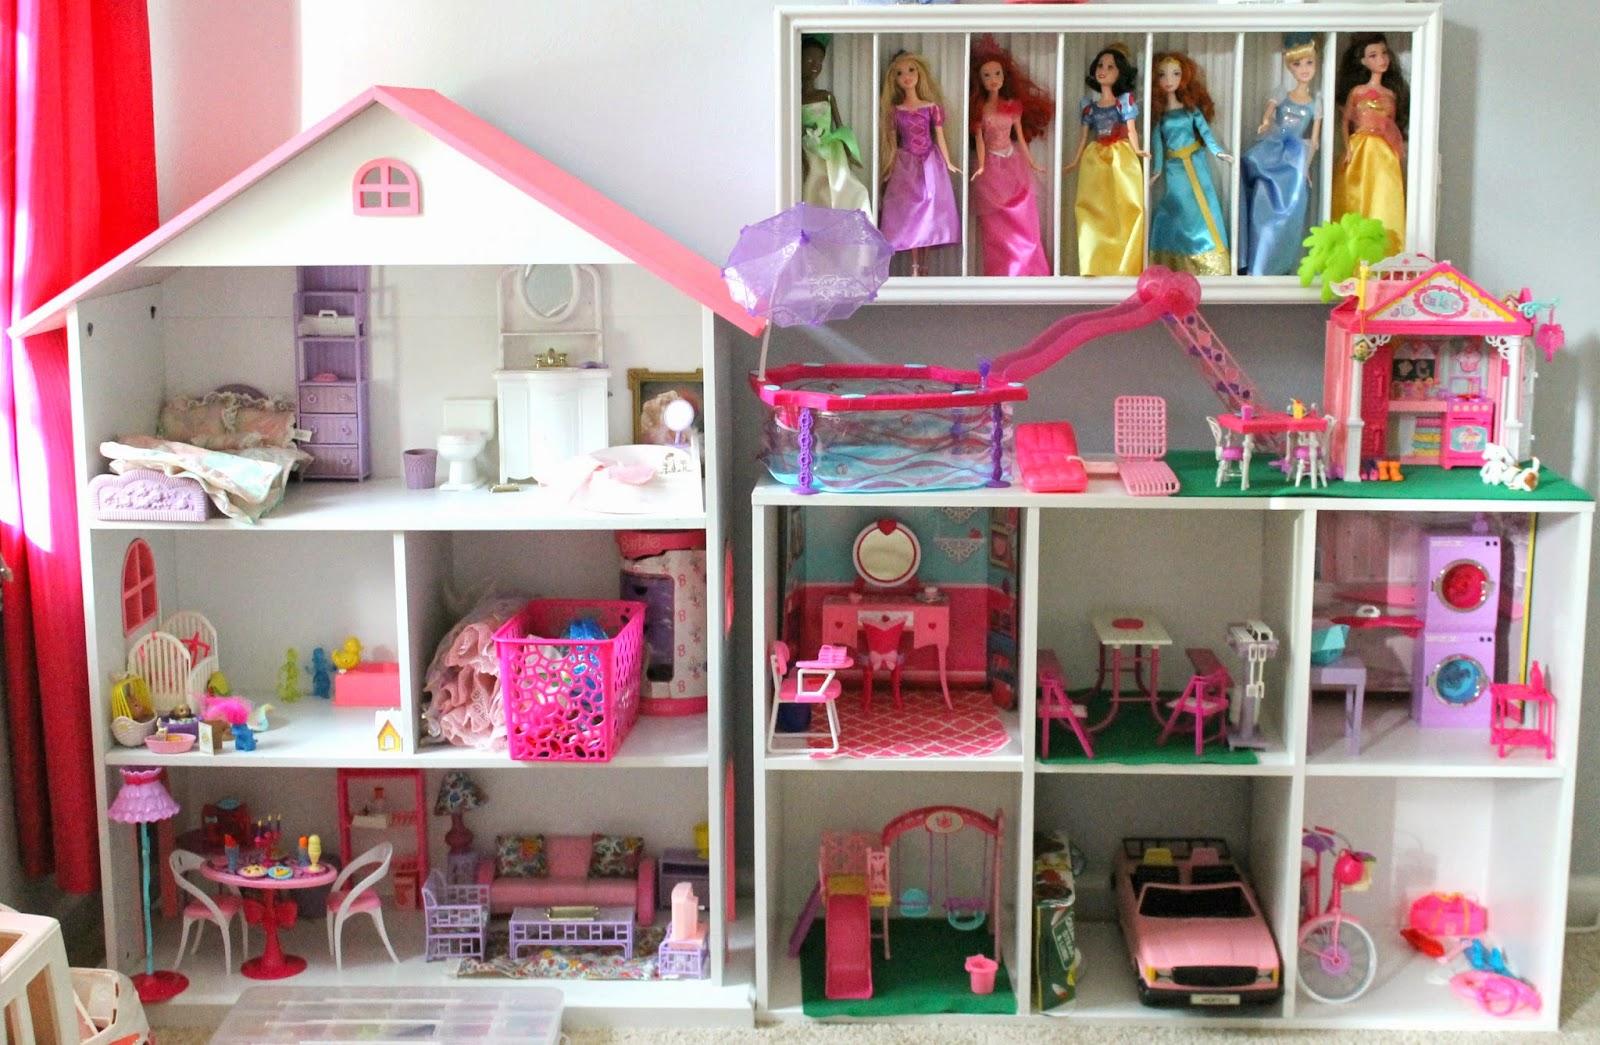 Diy bookshelf barbie house